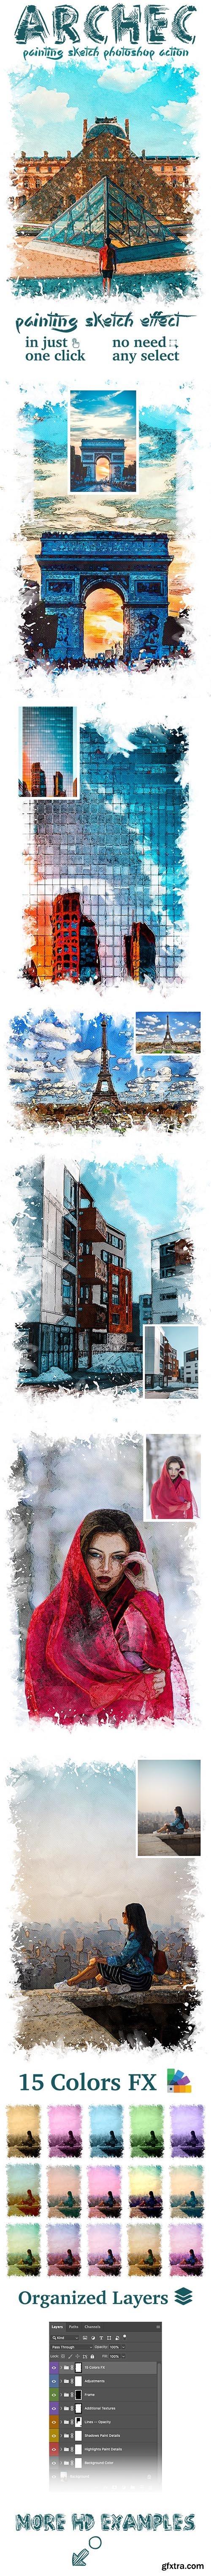 GraphicRiver - Archec - Painting Sketch Photoshop Action 25624369